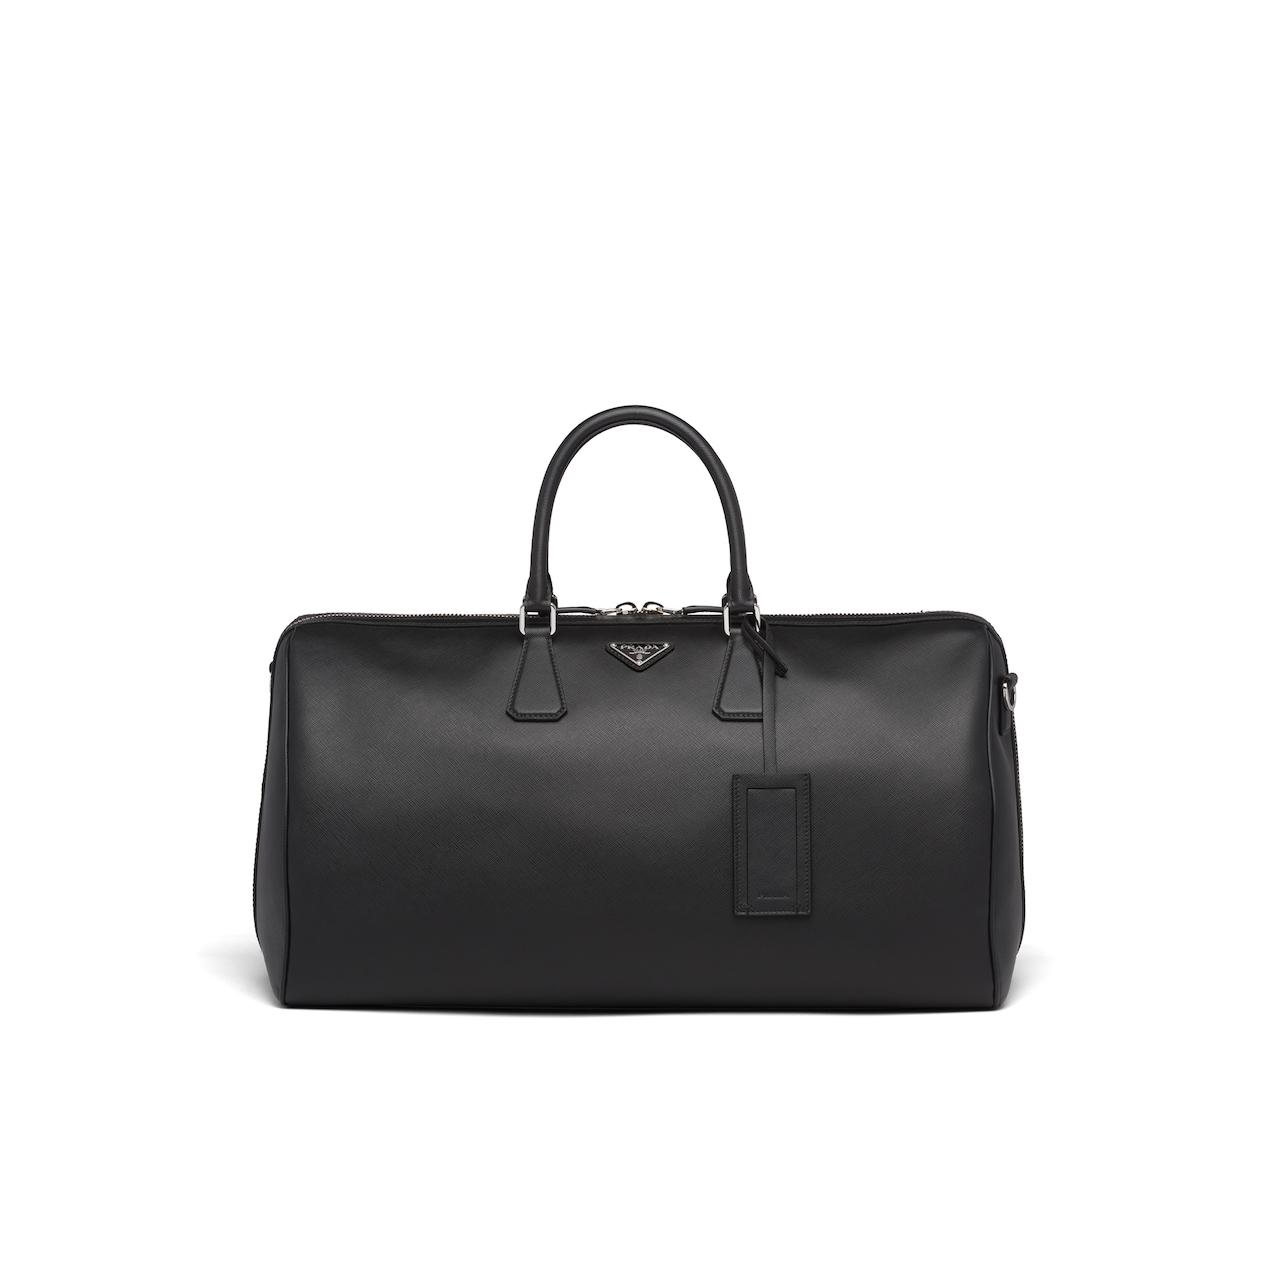 Prada Saffiano leather duffle bag 1